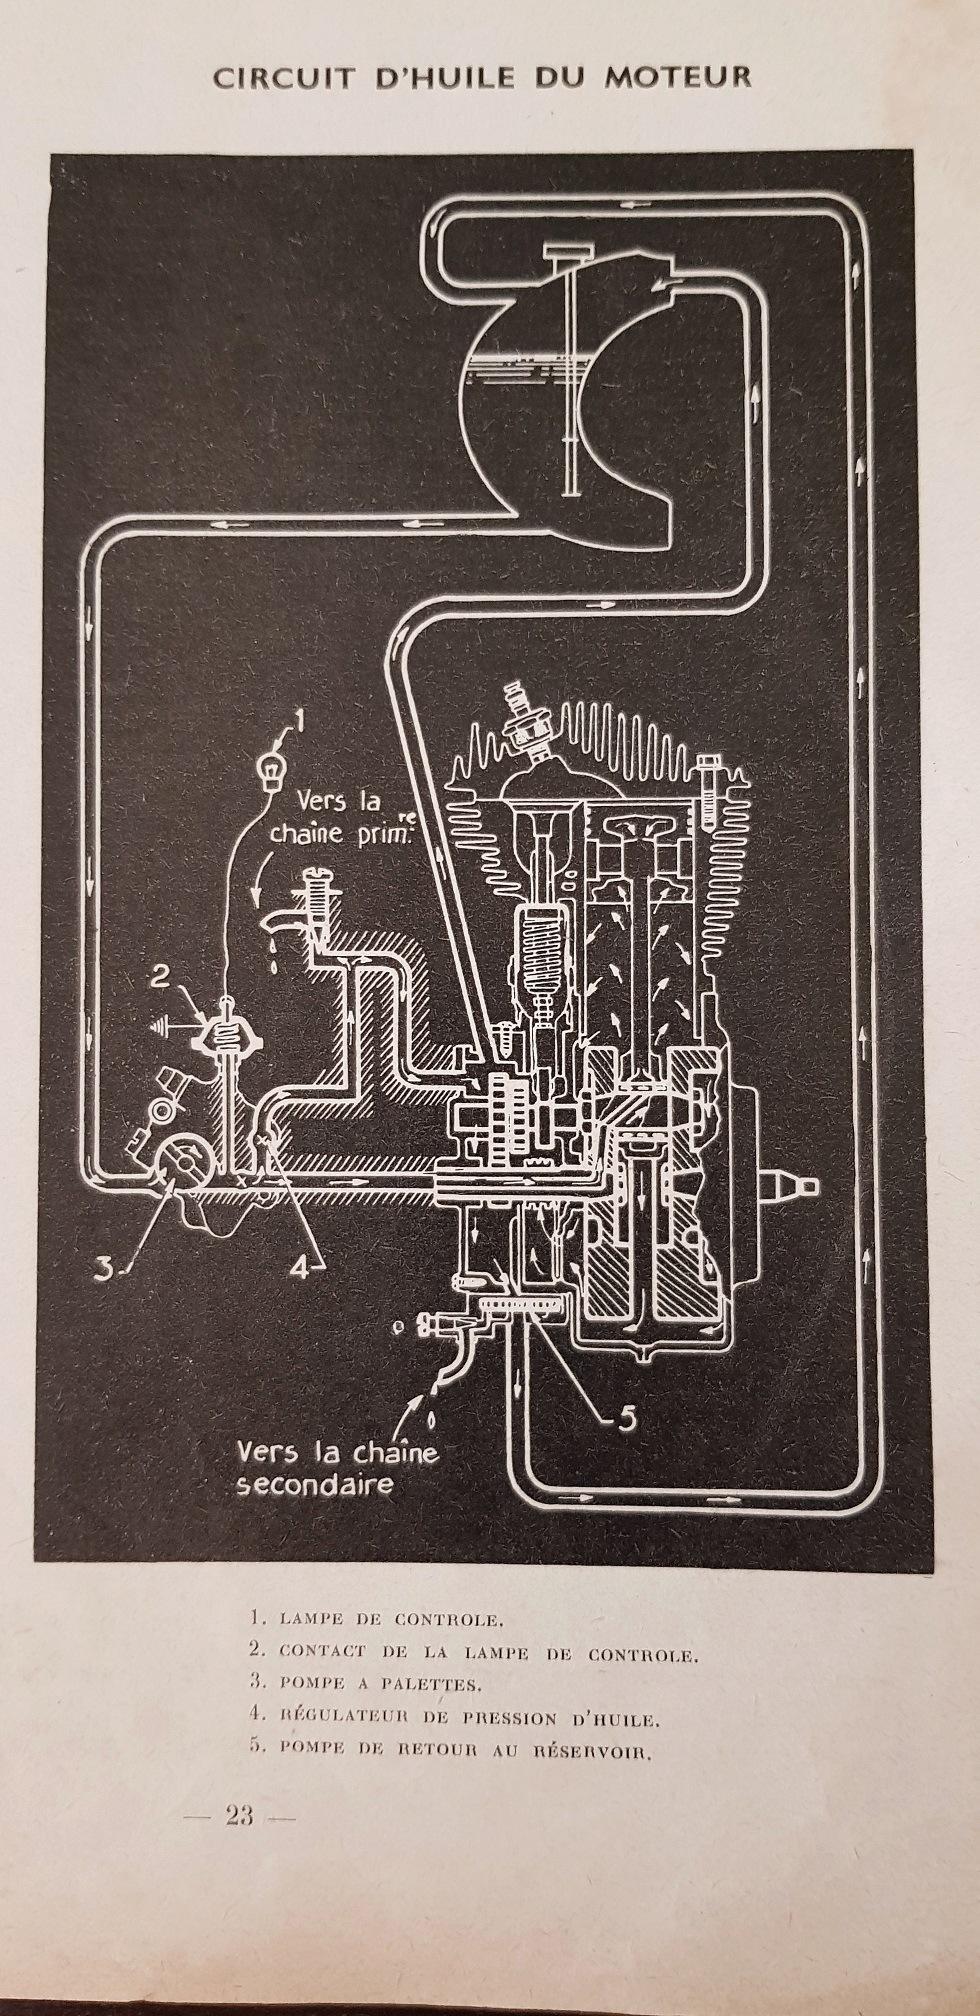 Ma WL 750 de 1951 - Page 11 Graiss12